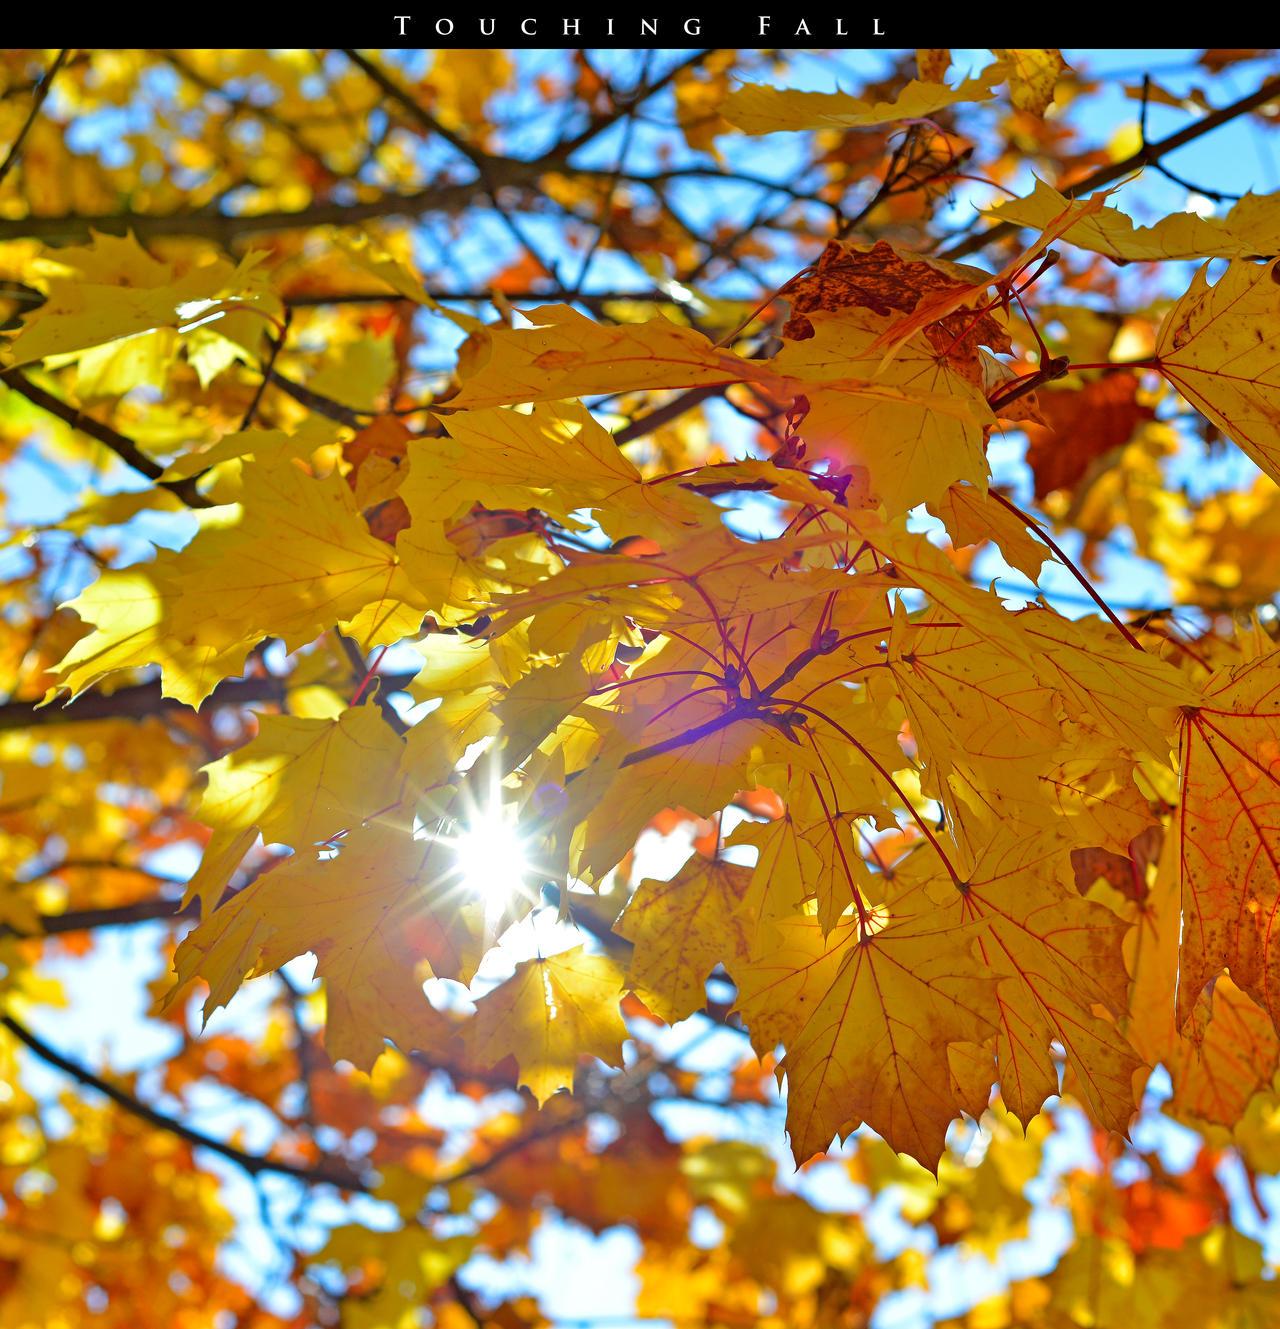 Touching Fall 10